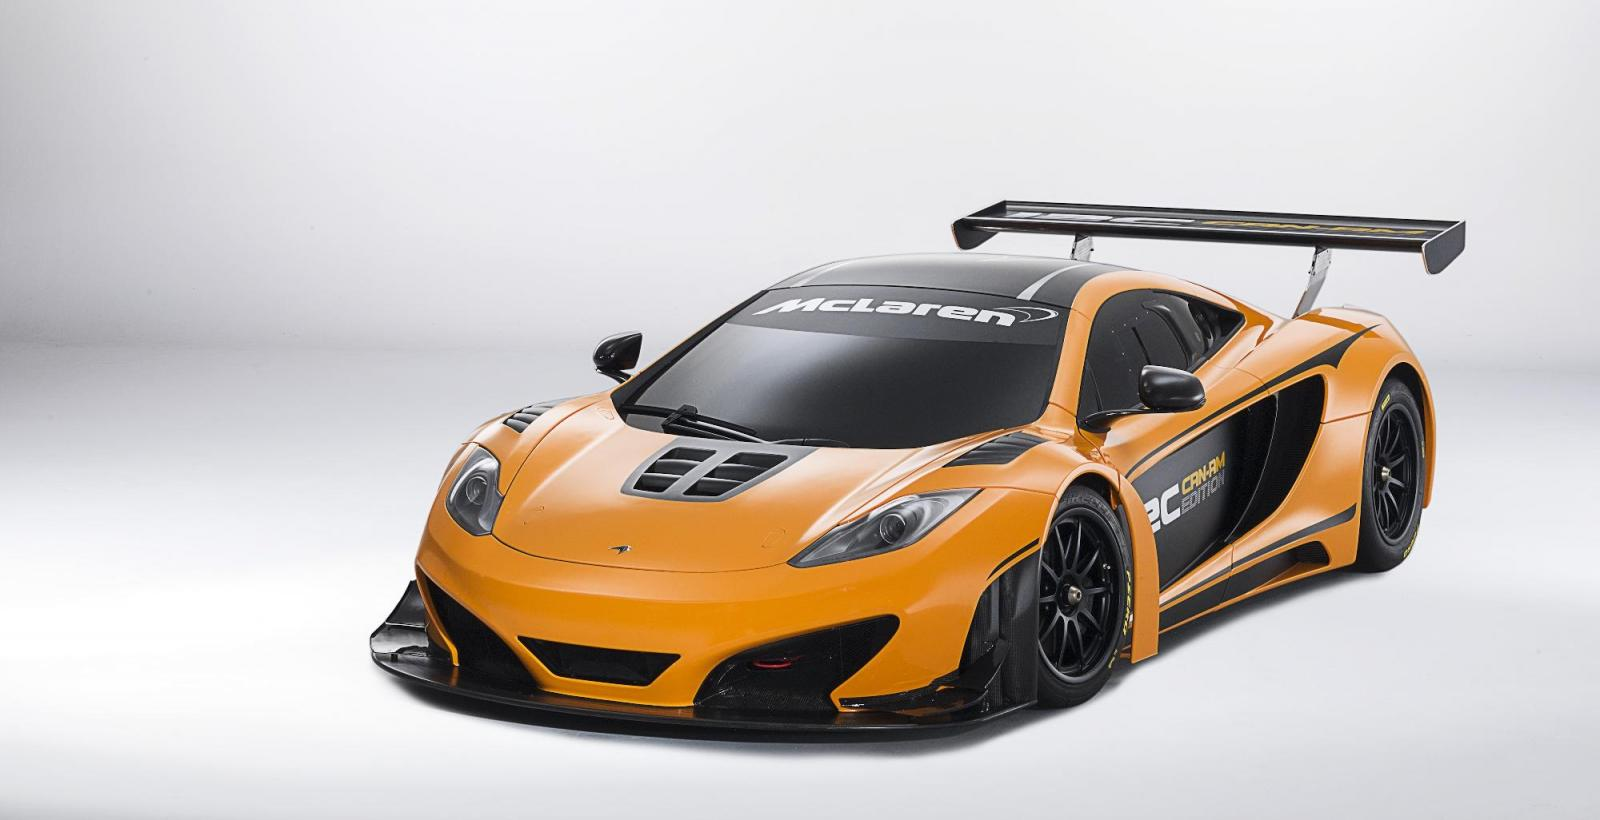 http://images.caradisiac.com/images/0/3/5/5/80355/S0-McLaren-MP4-12C-Cam-Am-Edition-Racing-Concept-268724.jpg